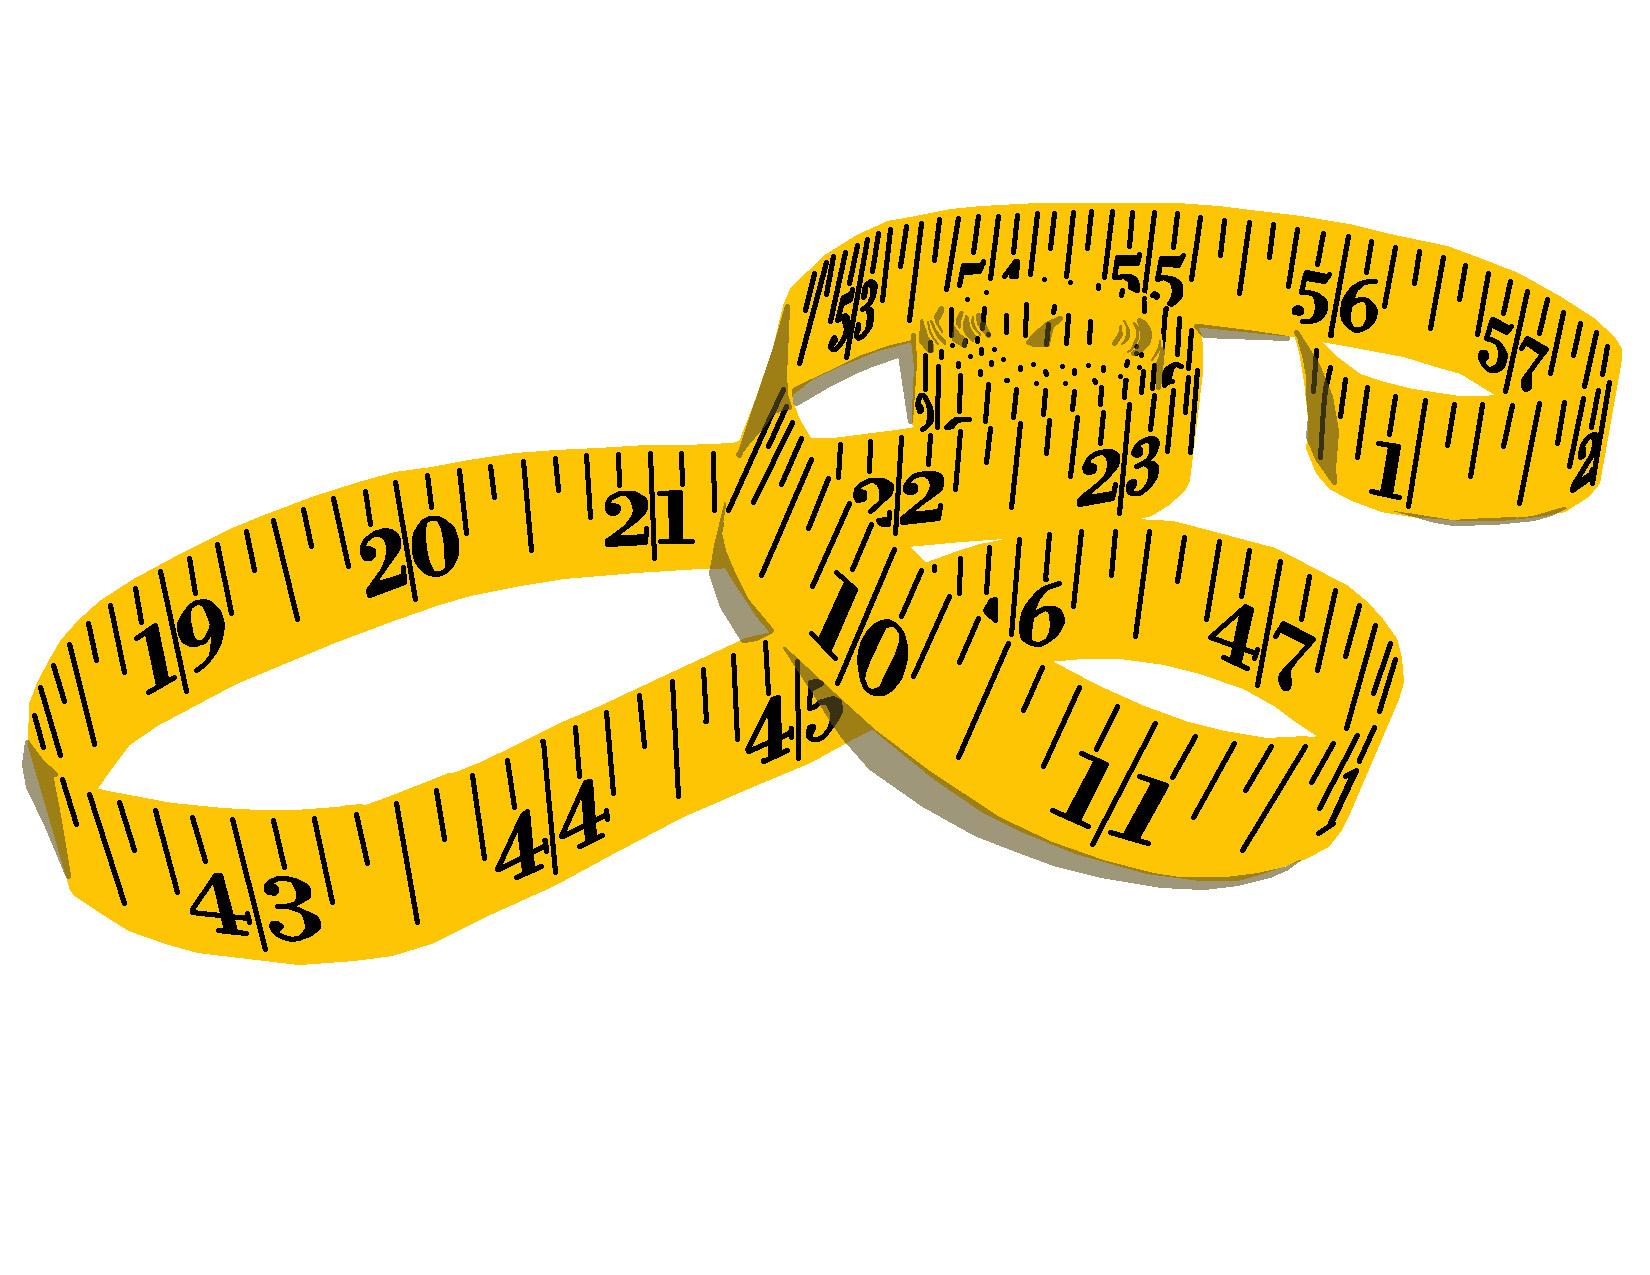 Measuring Tape Clip Art Cliparts Co-Measuring Tape Clip Art Cliparts Co-18